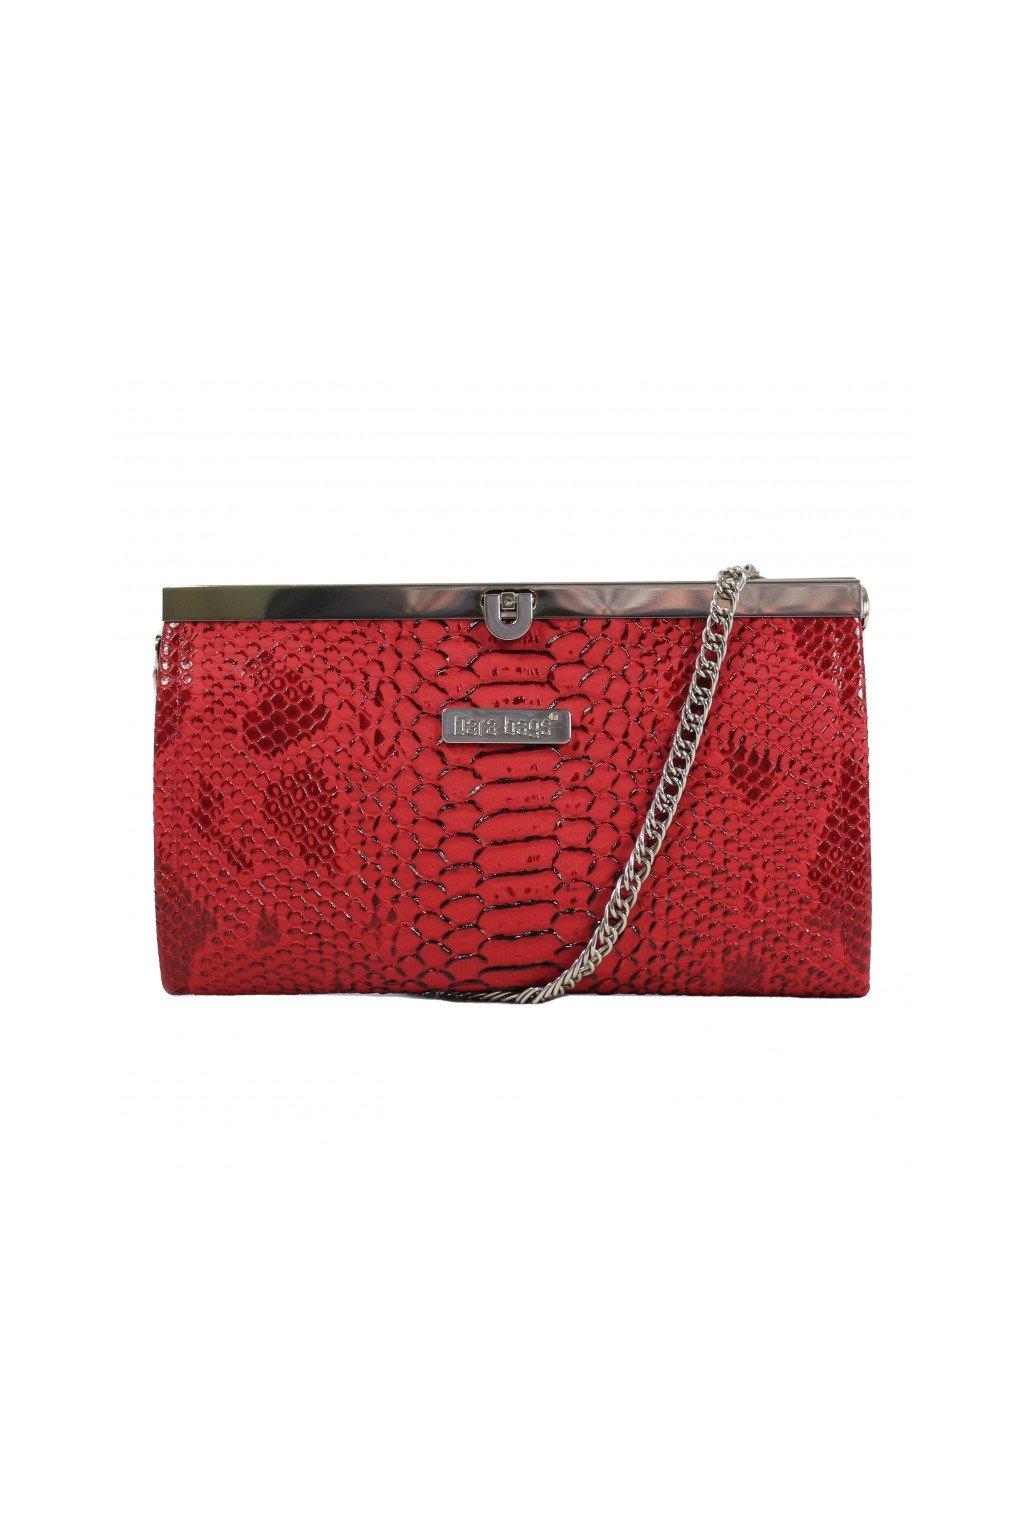 Elegantni mala kabelka Merci Dara bags cervena 1